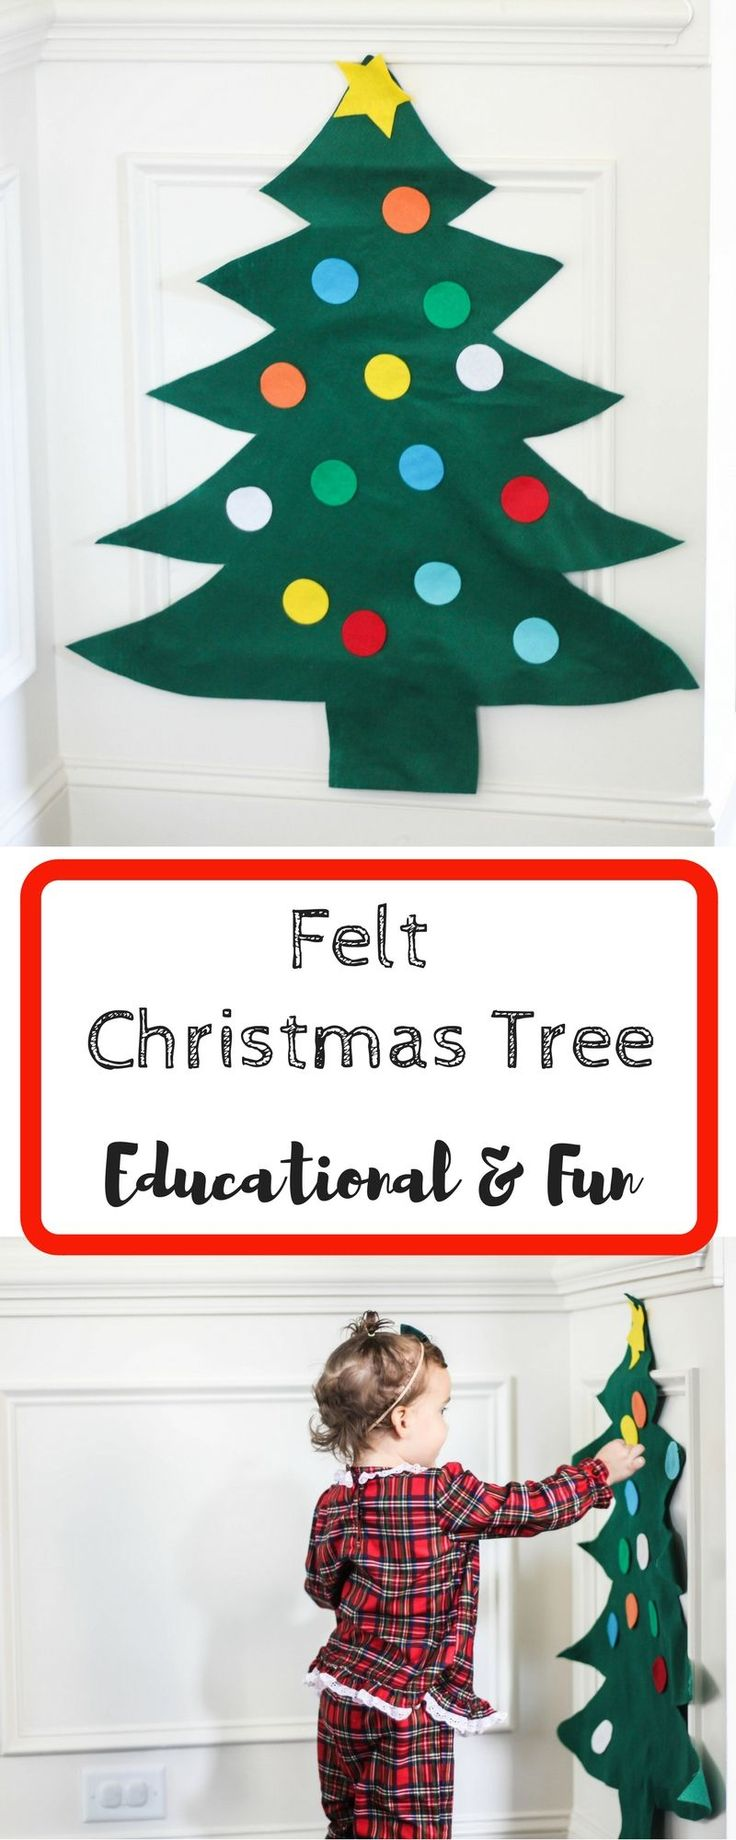 Felt Christmas Tree | Felt Tree | Felt Tree Decorating | Felt Wall | Educational Christmas Toys | Best Toddler Toys | Busy Little Izzy | Motherhood | Children Christmas Traditions #christmastraditions #christmasfelttree